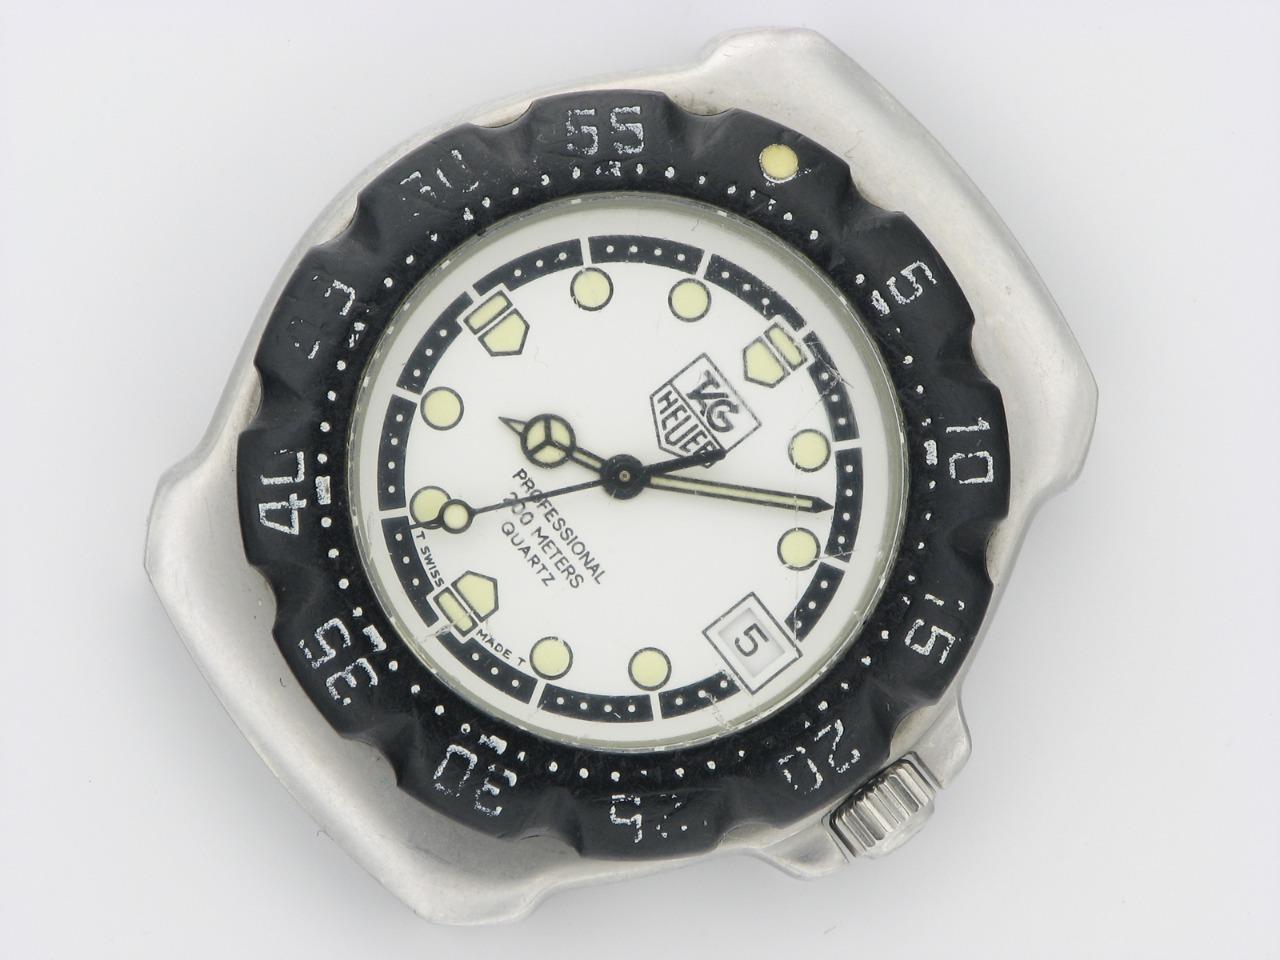 Tag Heuer Formula 1 Stainless Steel Men's Vintage watch ...